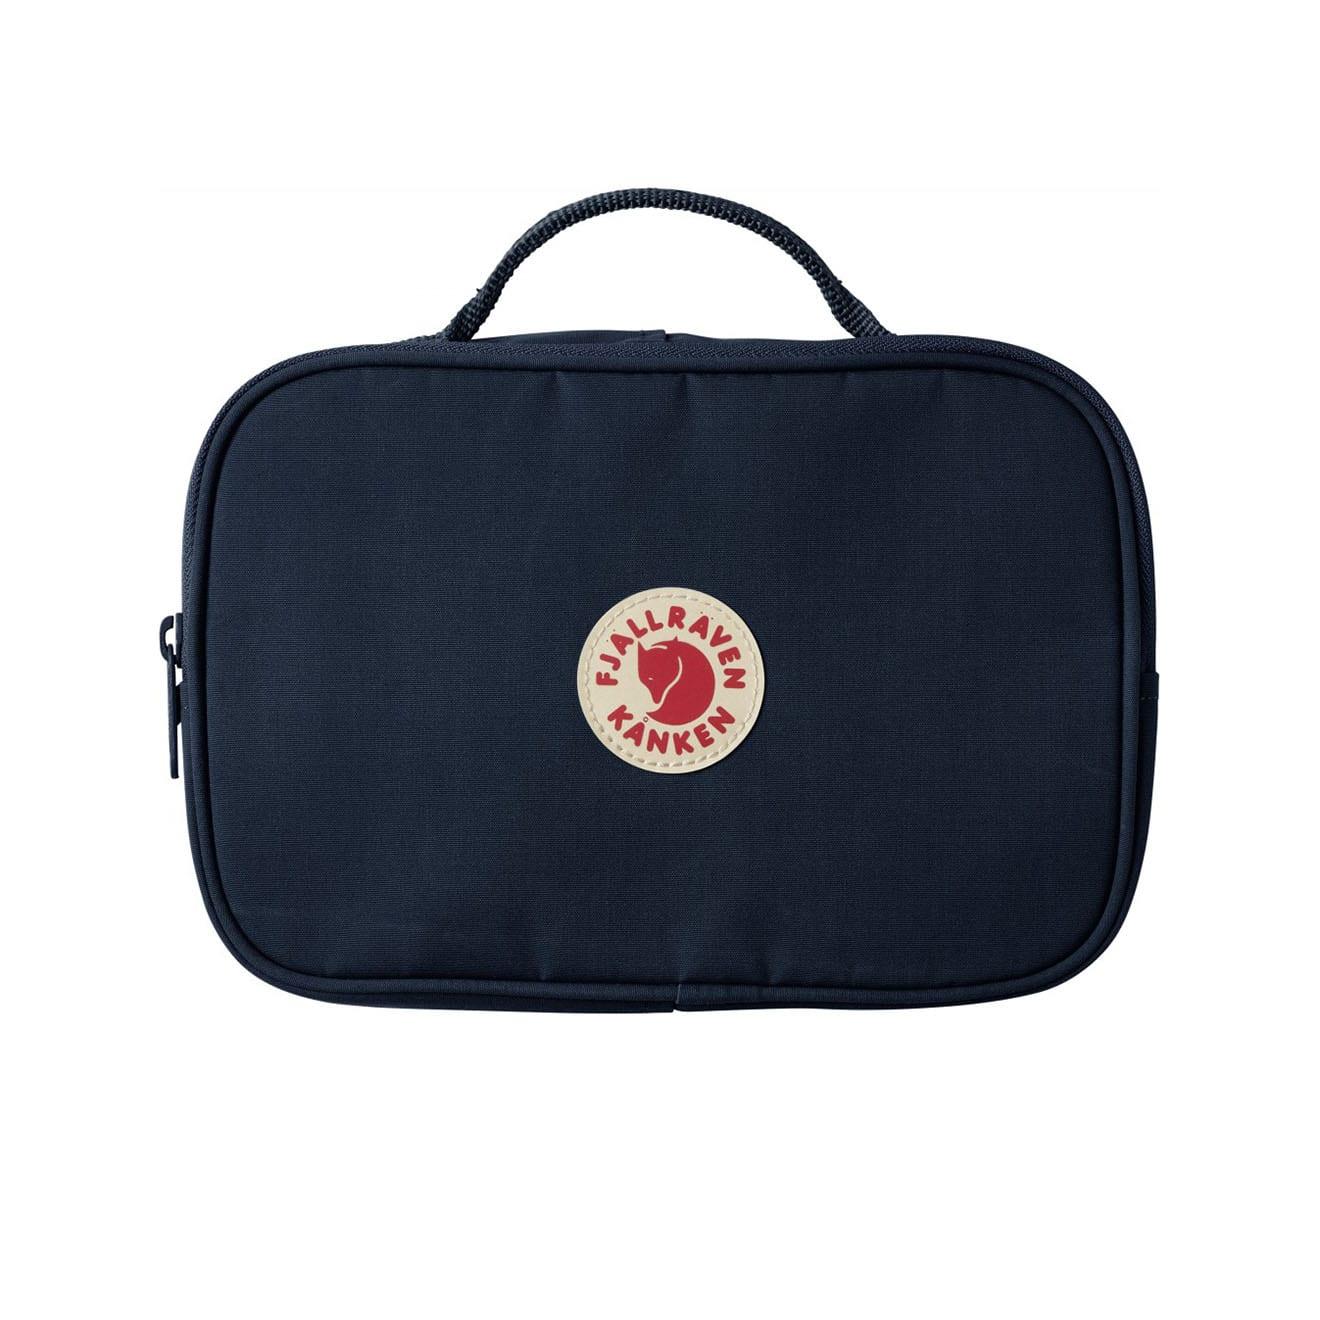 Fjallraven Kanken Toiletry Bag Navy